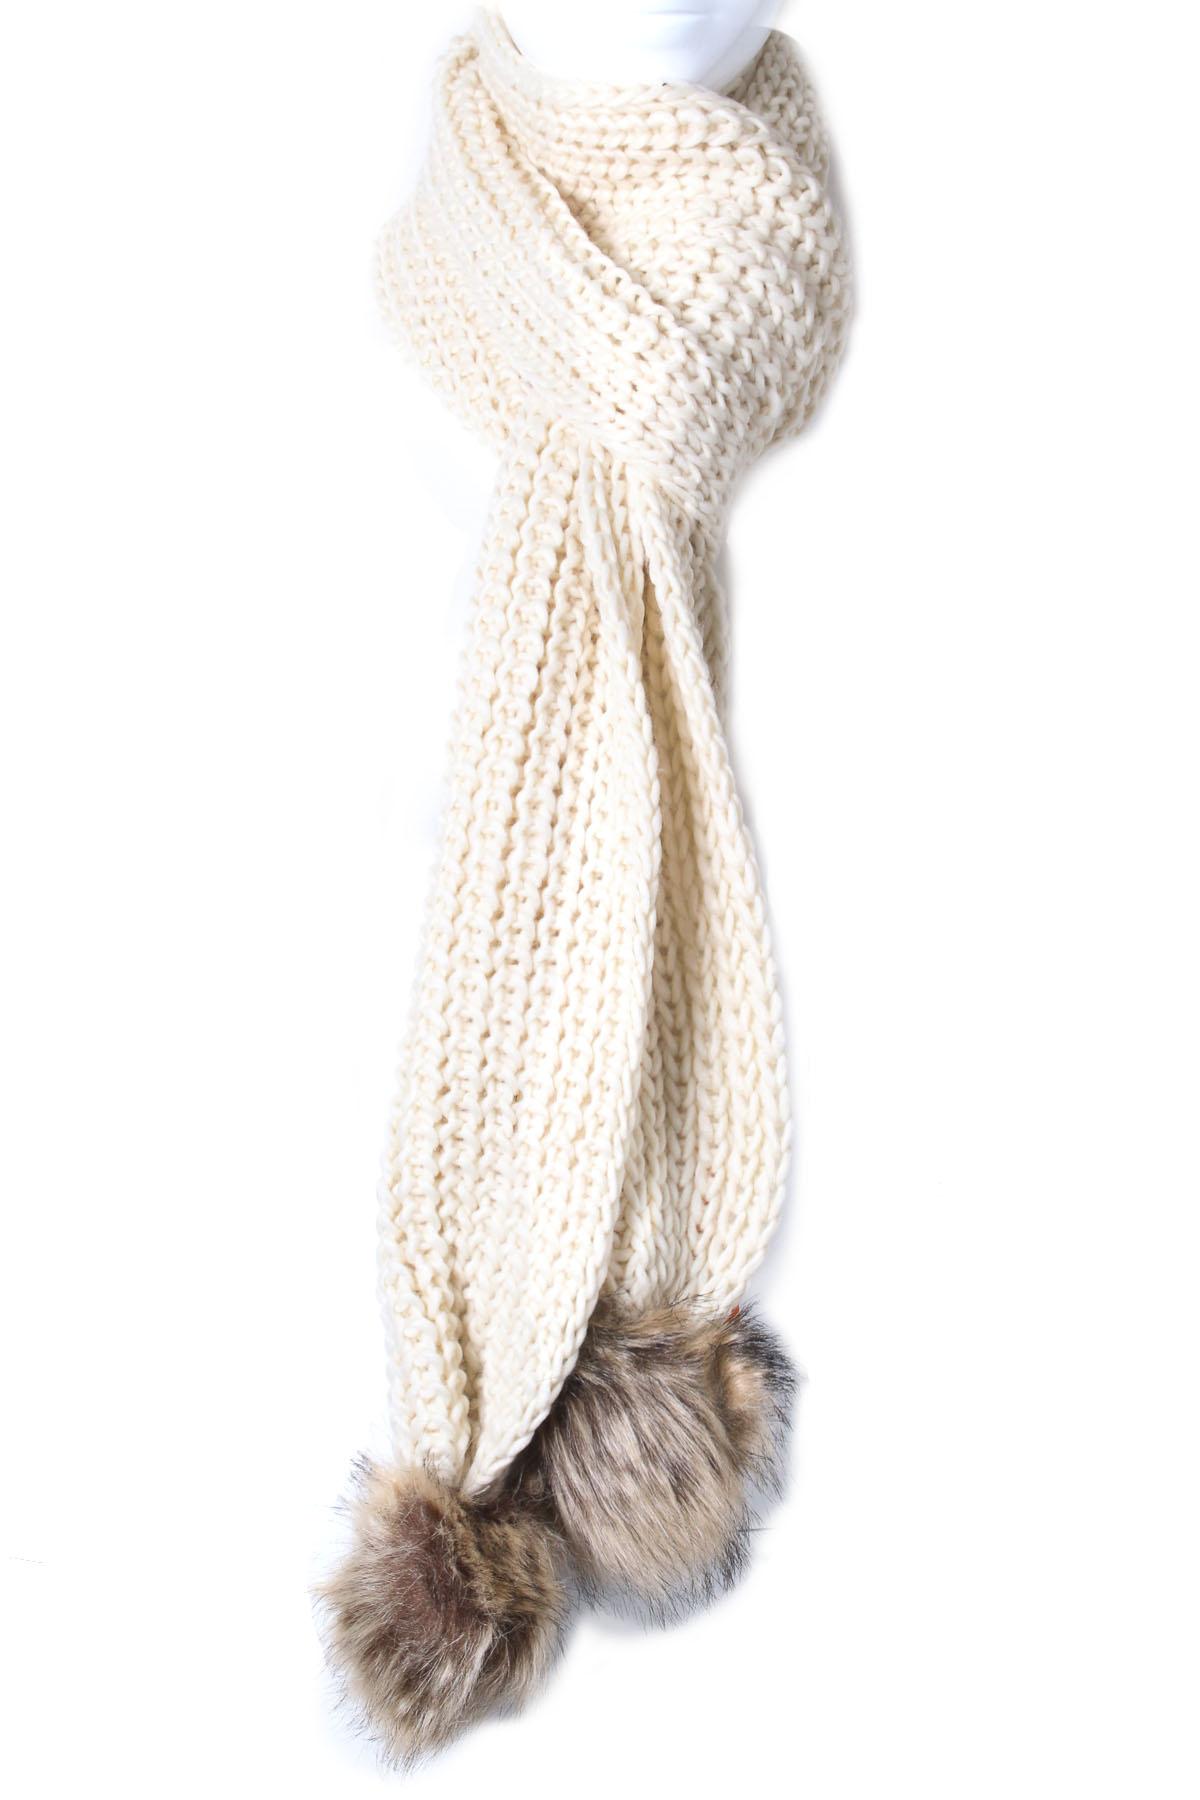 Knitting Pattern For Scarf With Pom Poms : Knit Pom Pom Scarf - Scarves